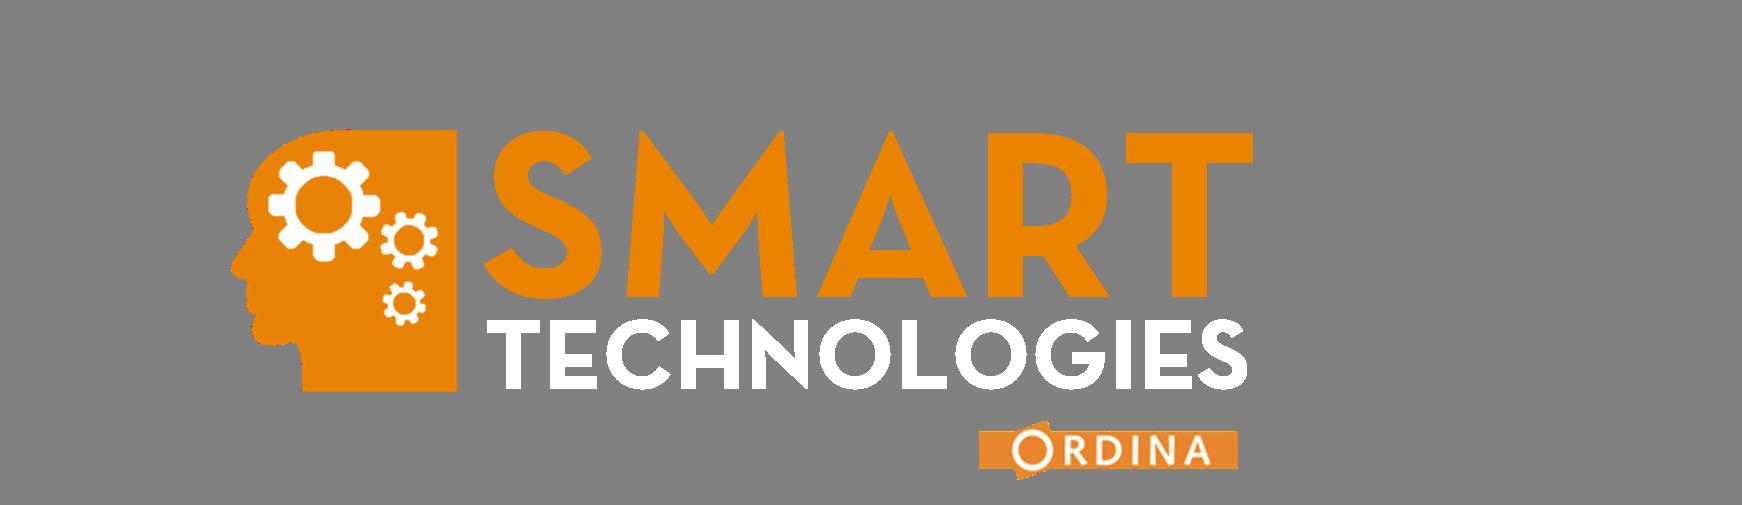 Ordina-Smart